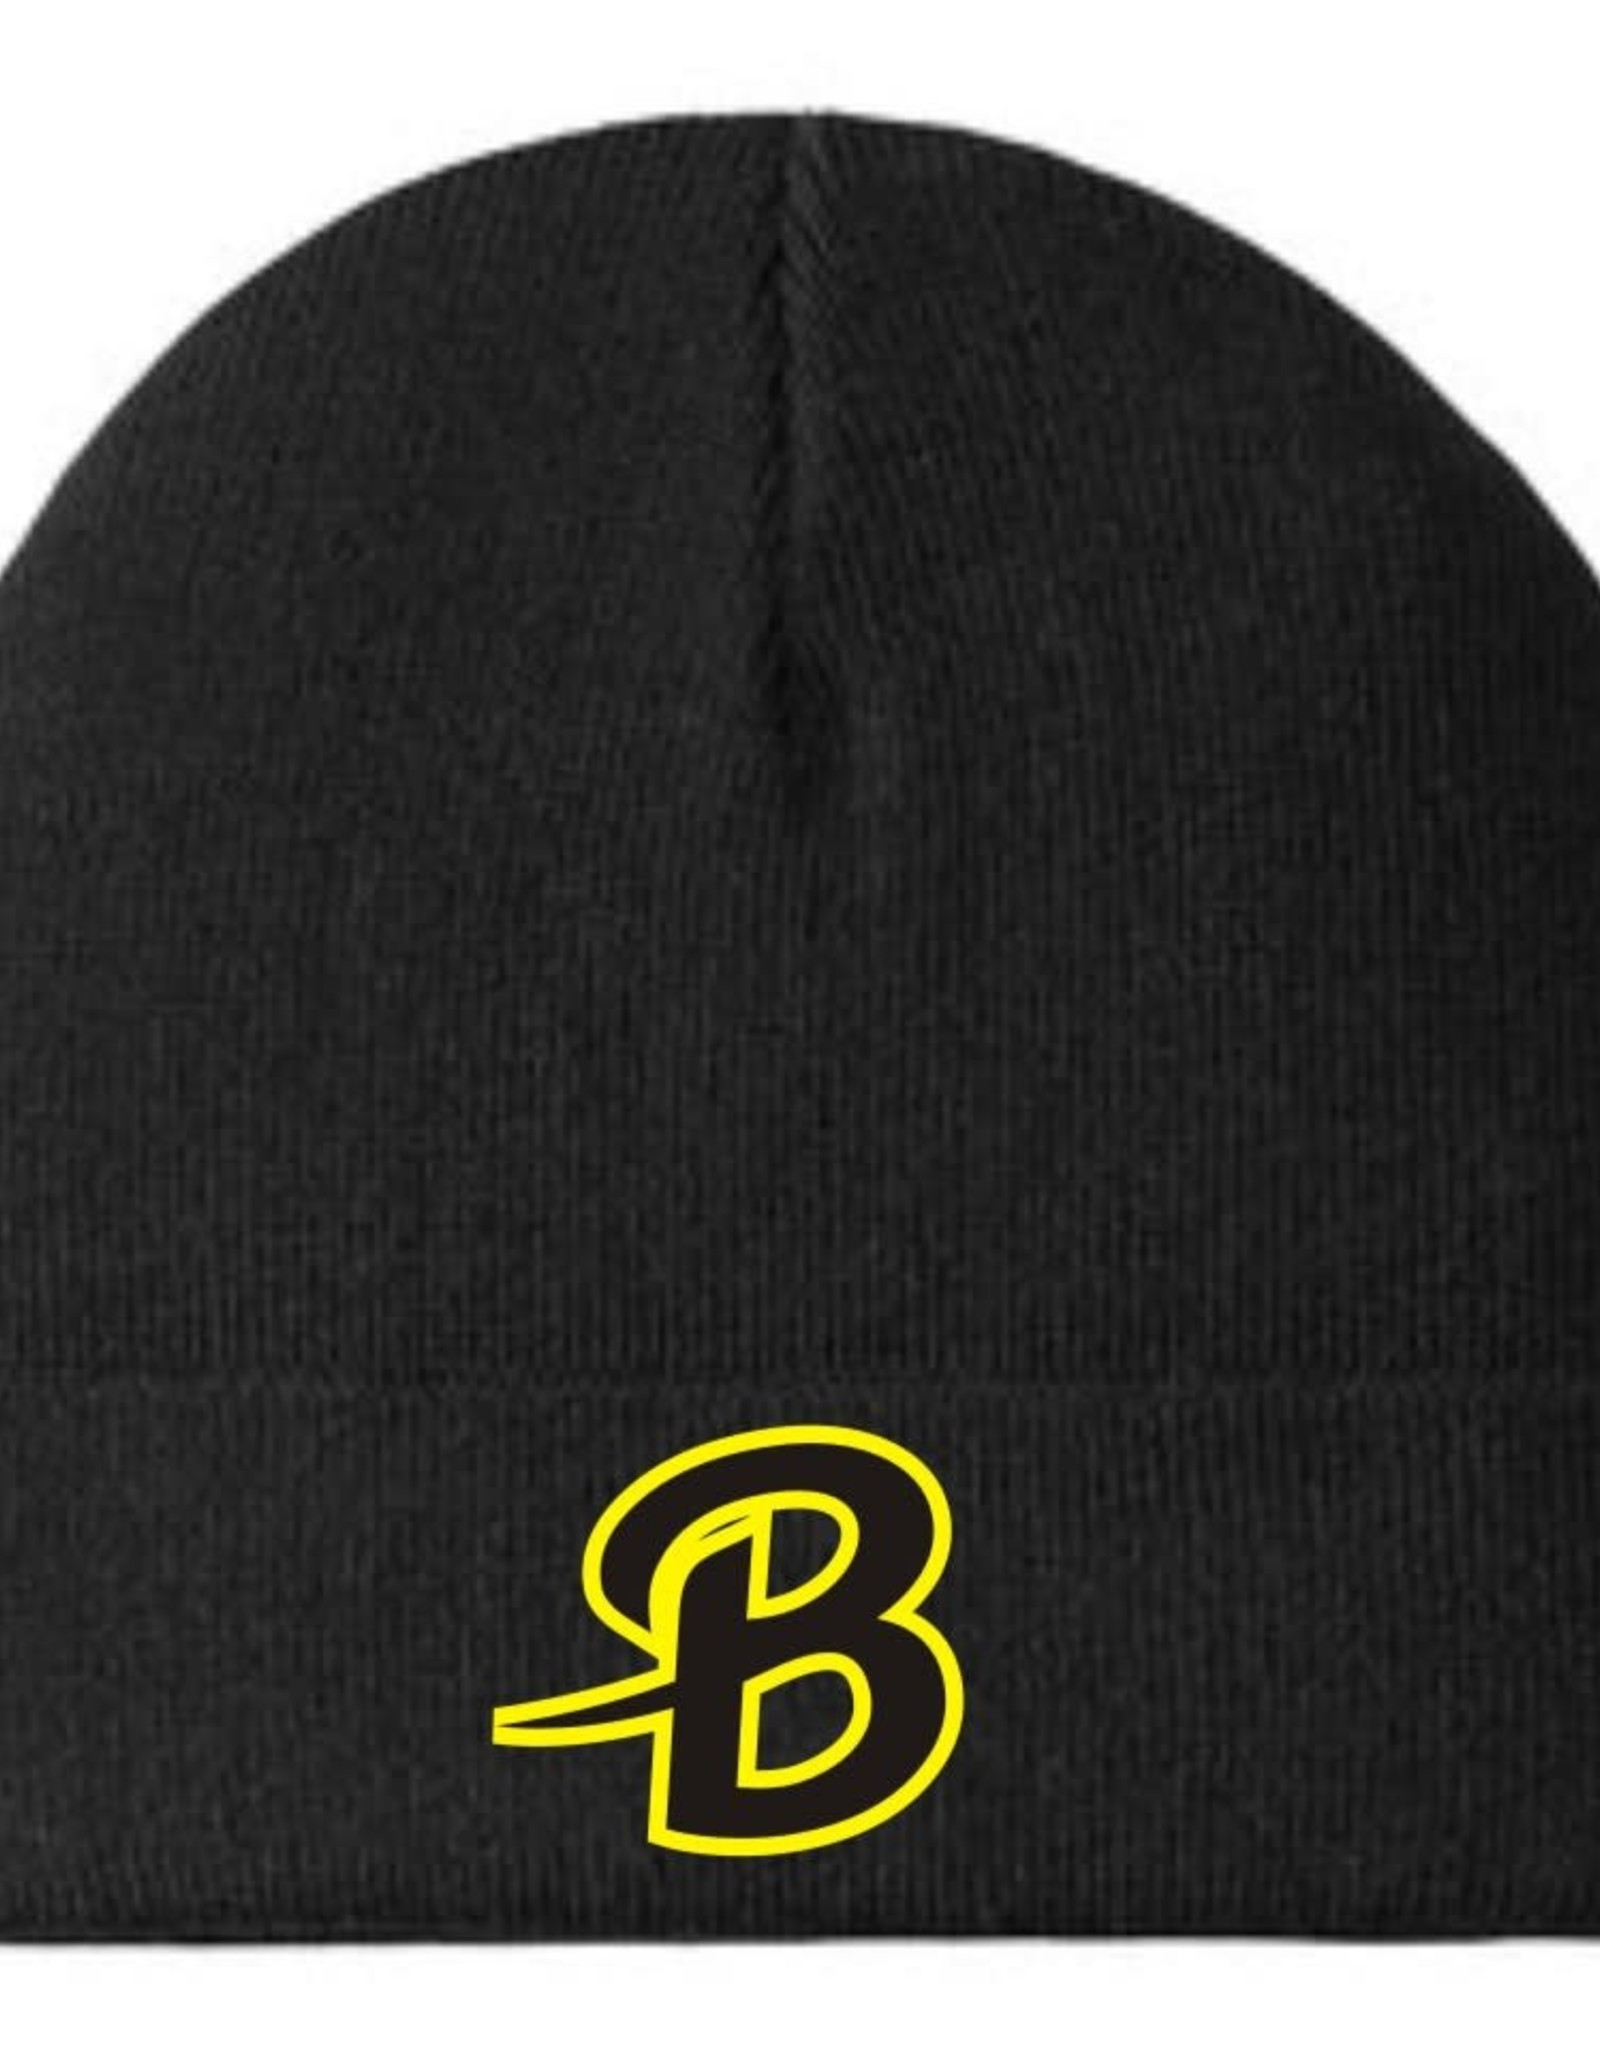 Port Authority B240-C939 Port Authority Knit Cuff Beanie - Black